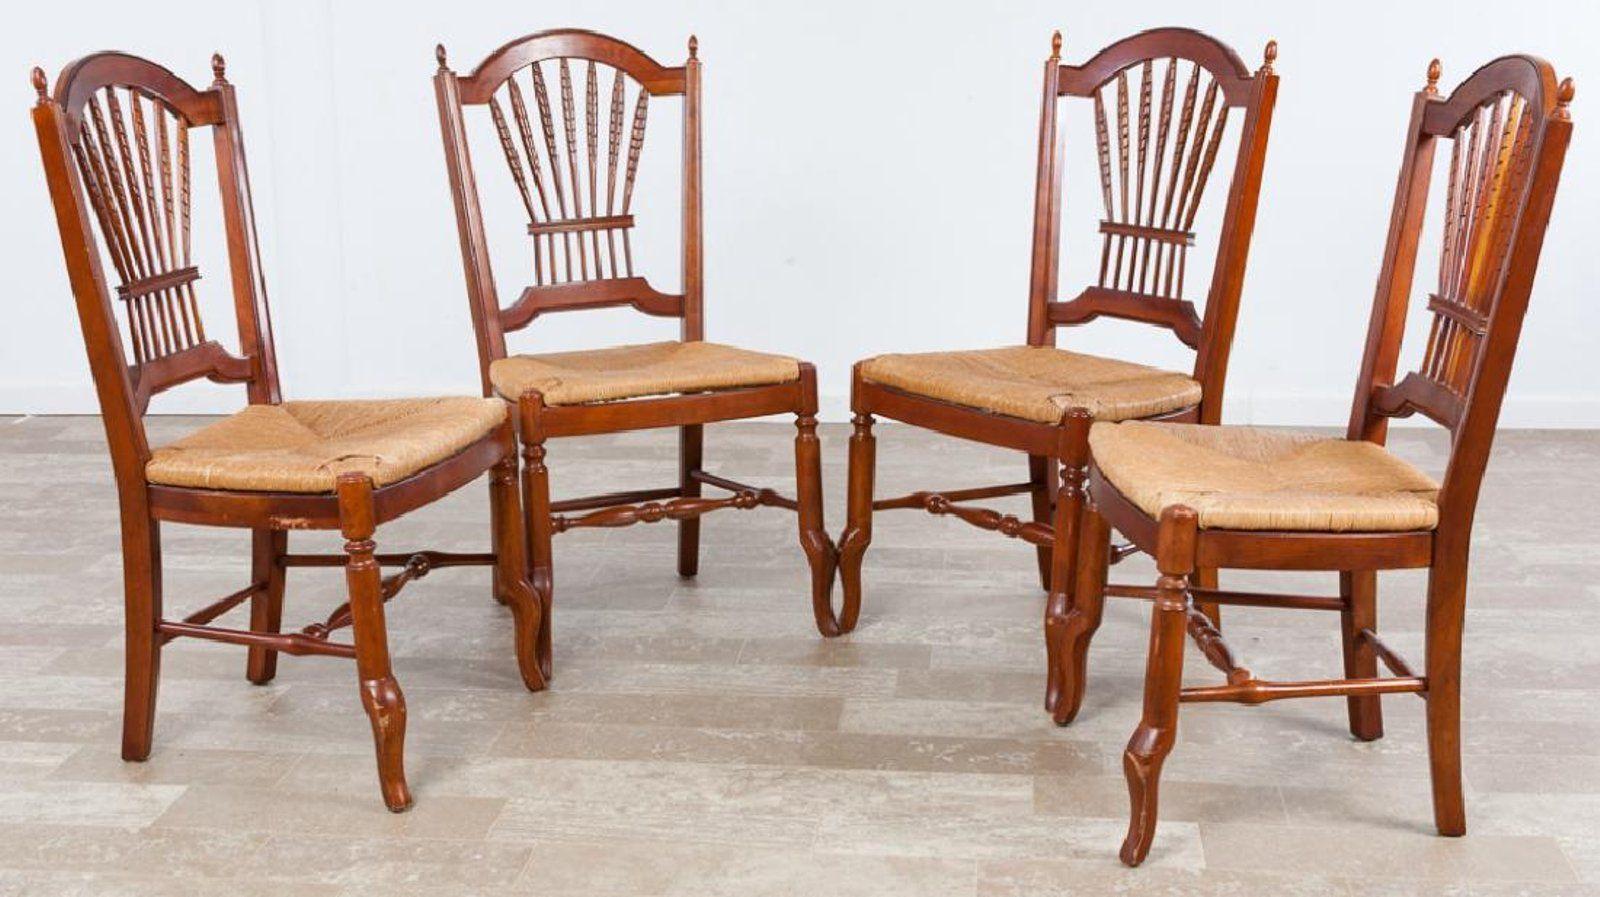 Ethan Allen Rush Bottom Chairs Set, Four (4)